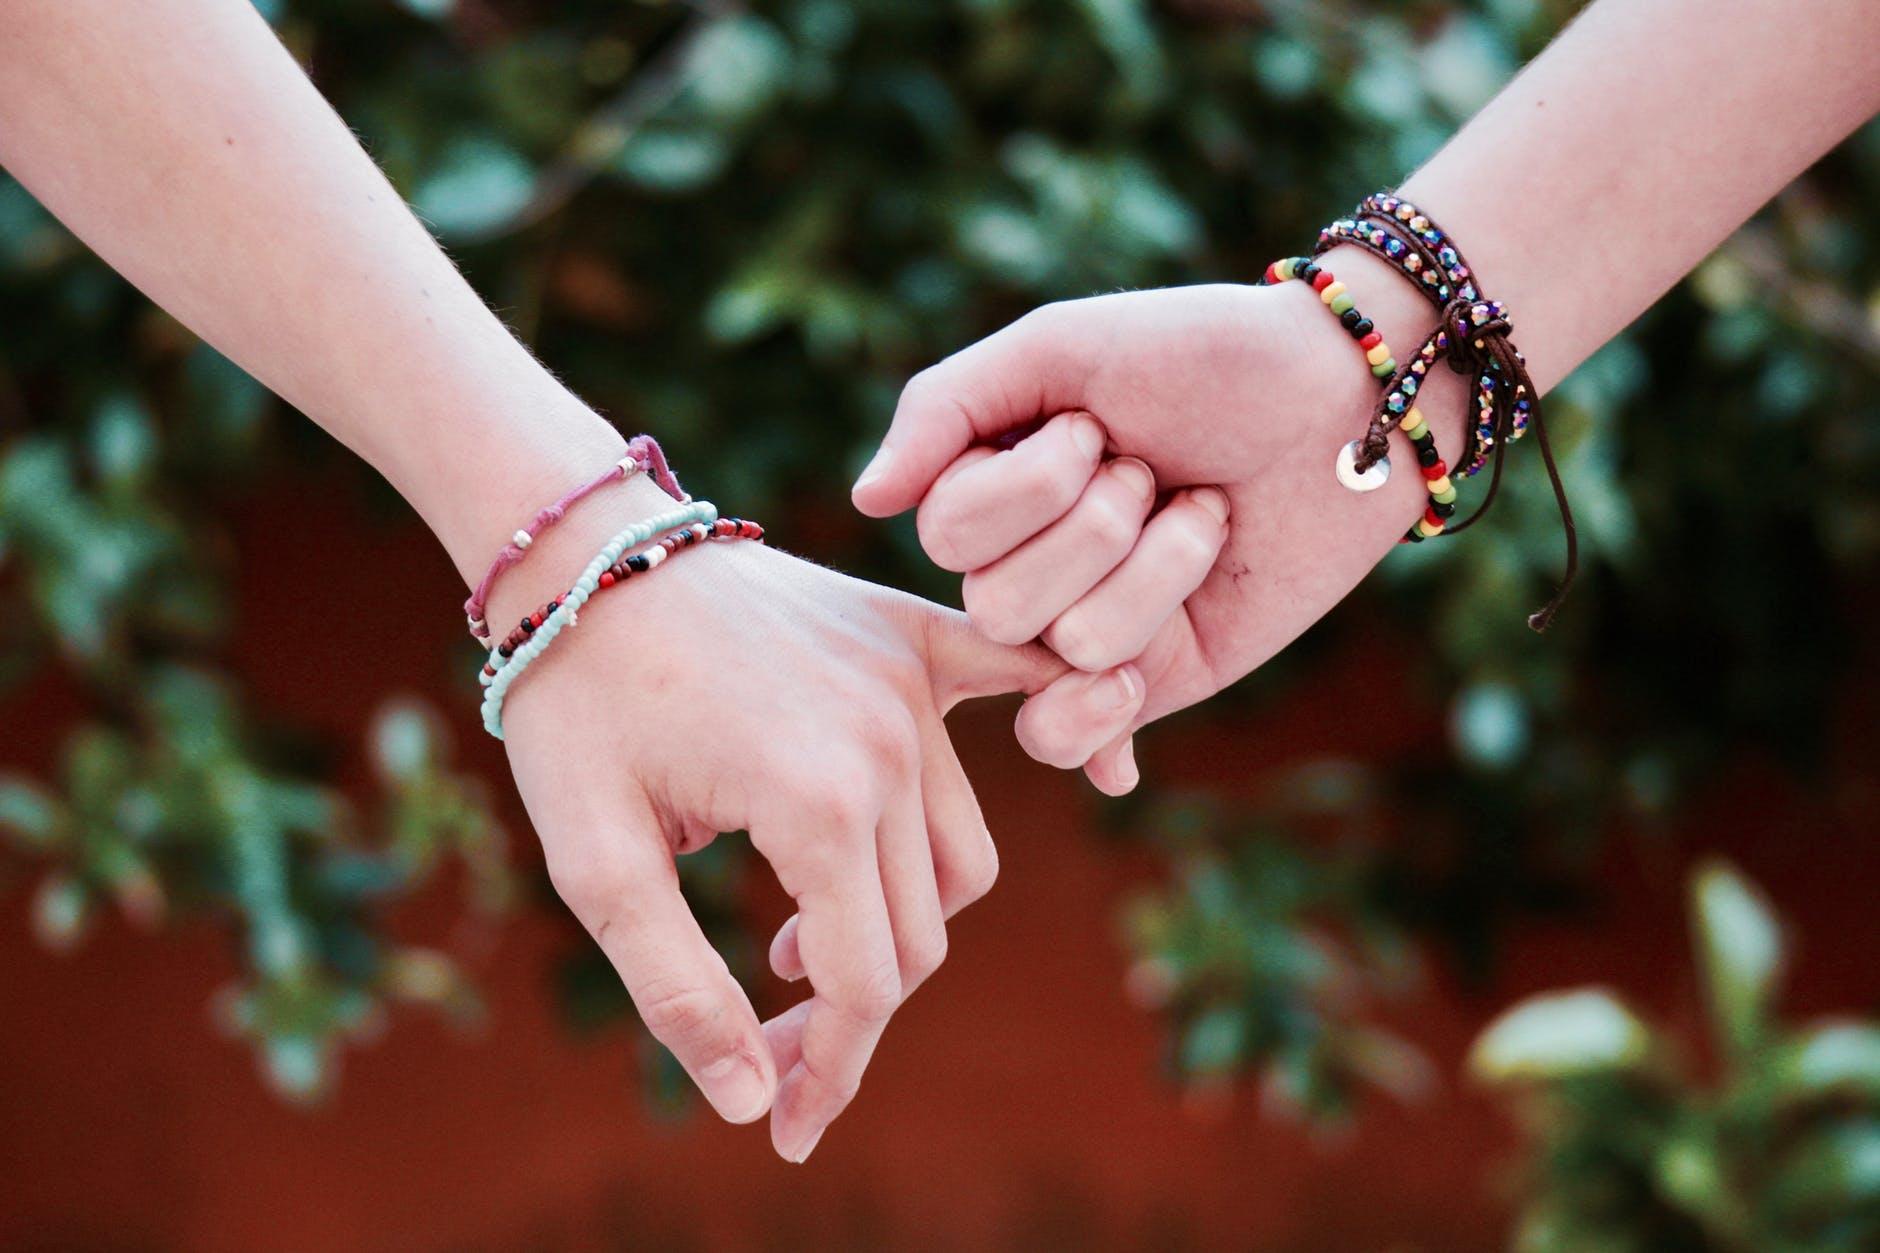 adult affection beads blur